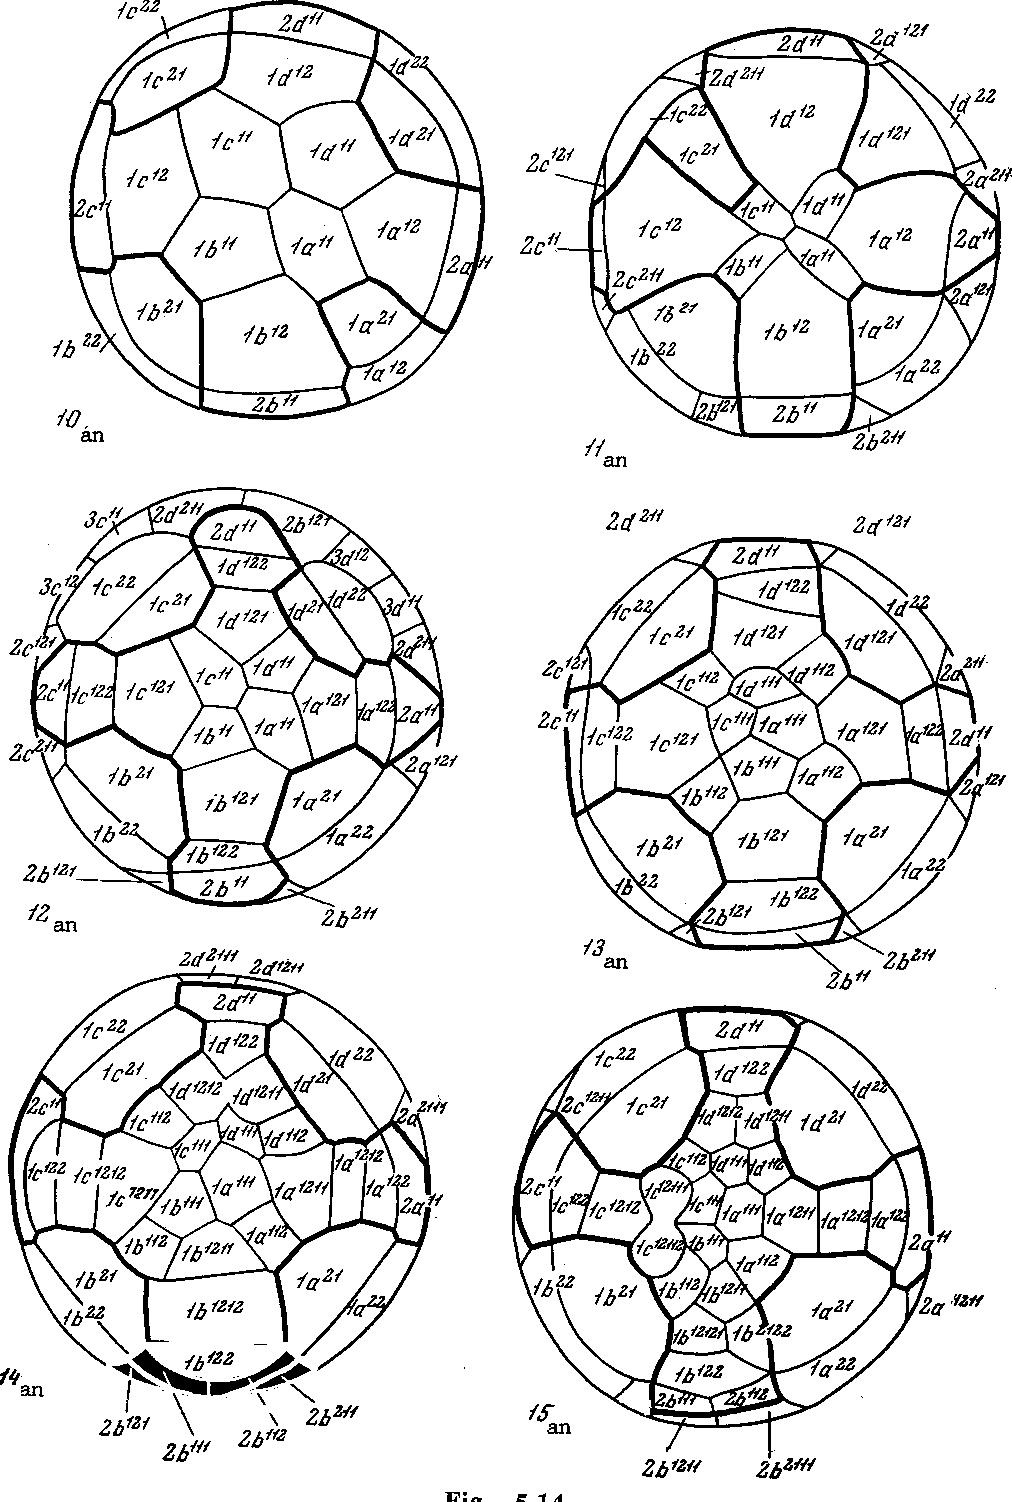 figure 5.14